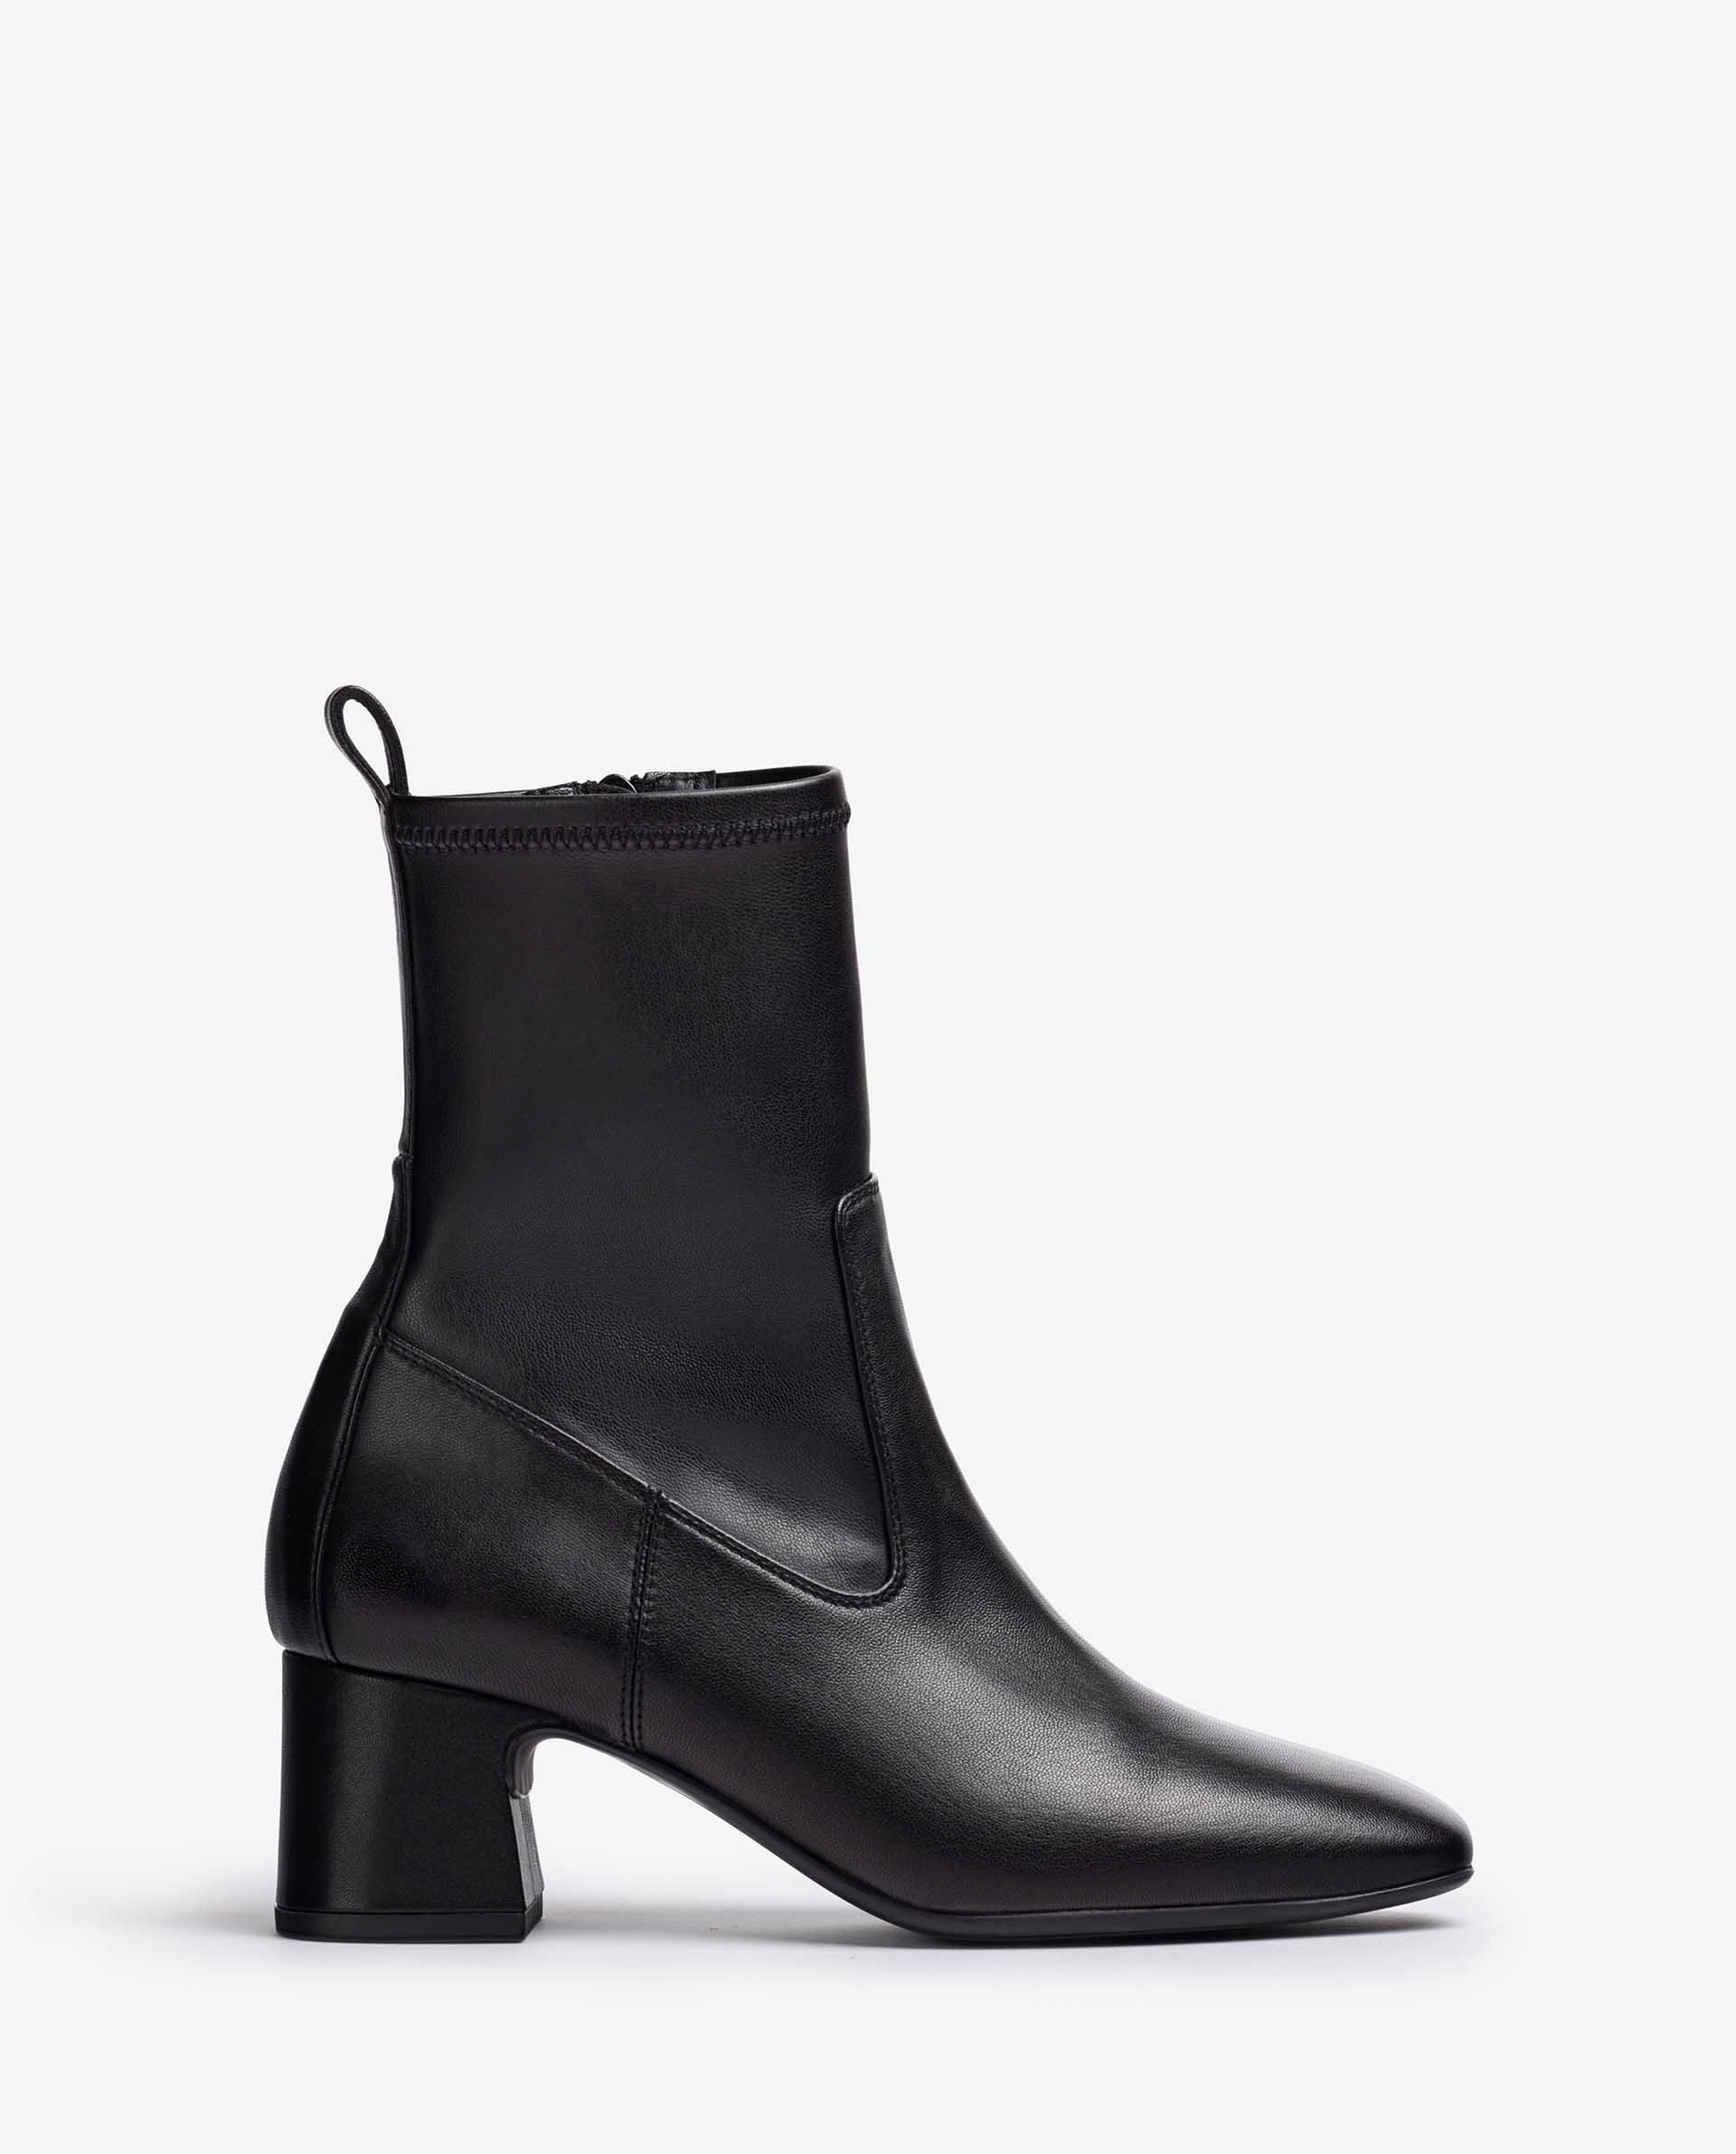 Unisa Ankle boots MICO_VU_STN black